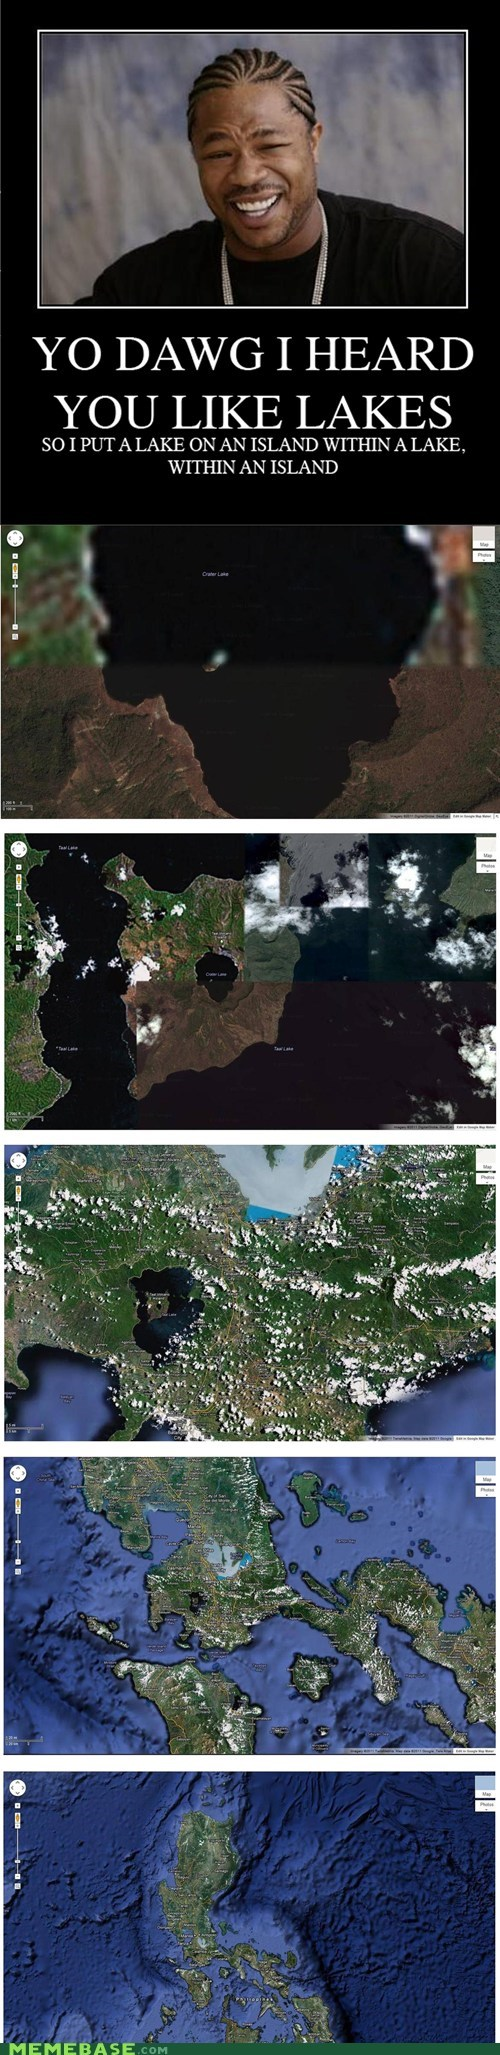 island lakes Maps wtf yo dawg - 5670126336